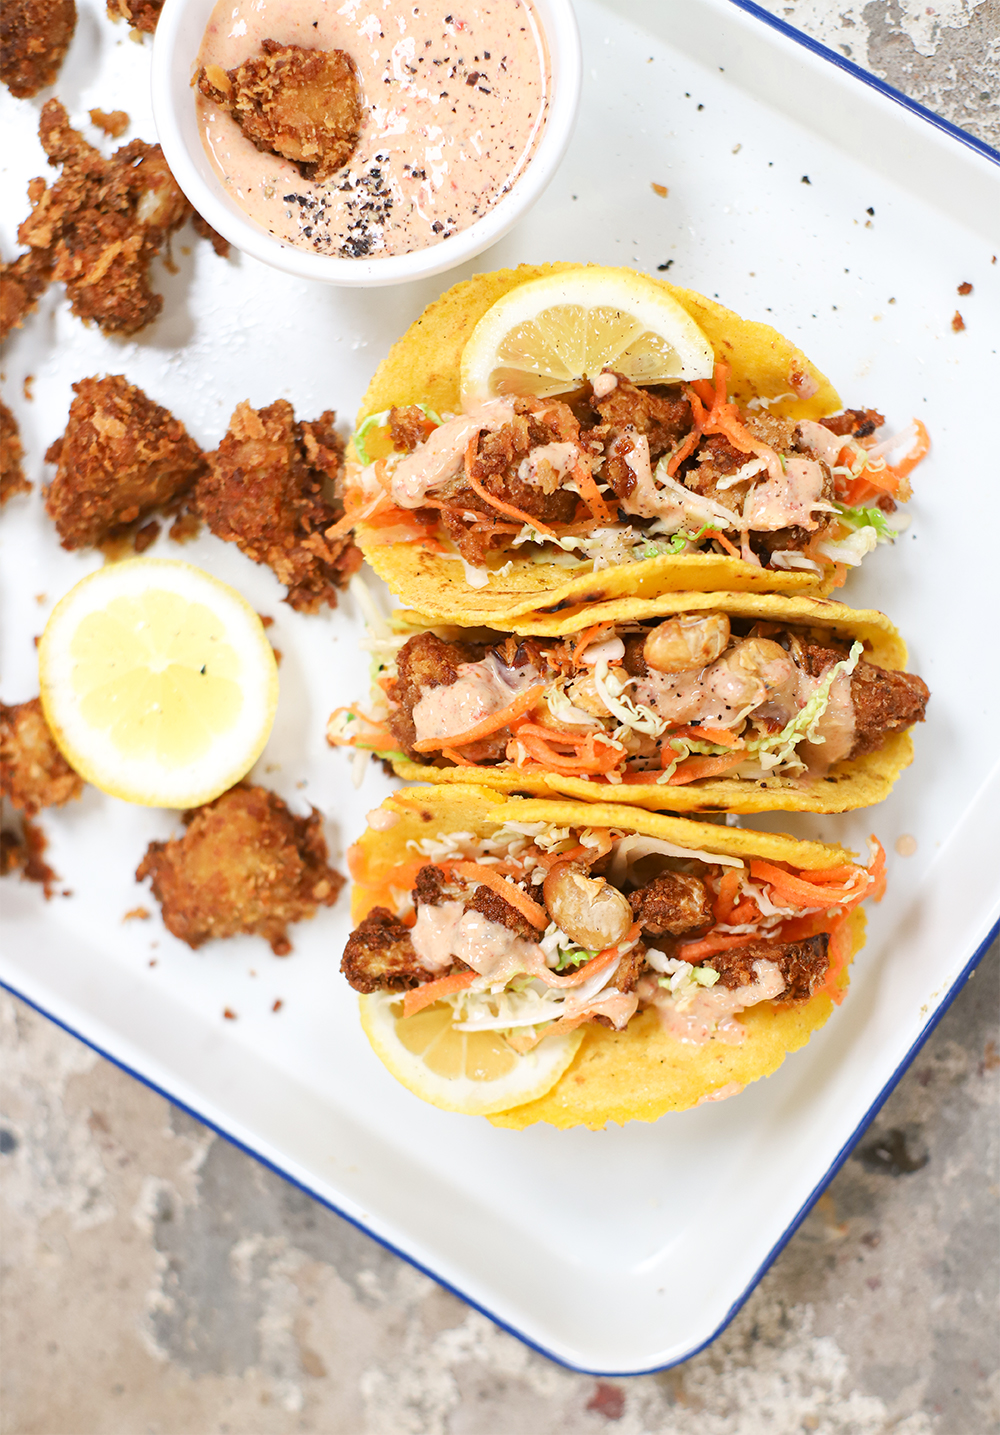 Taco's met krokante bloemkool, frisse koolsla & Chipotlé saus